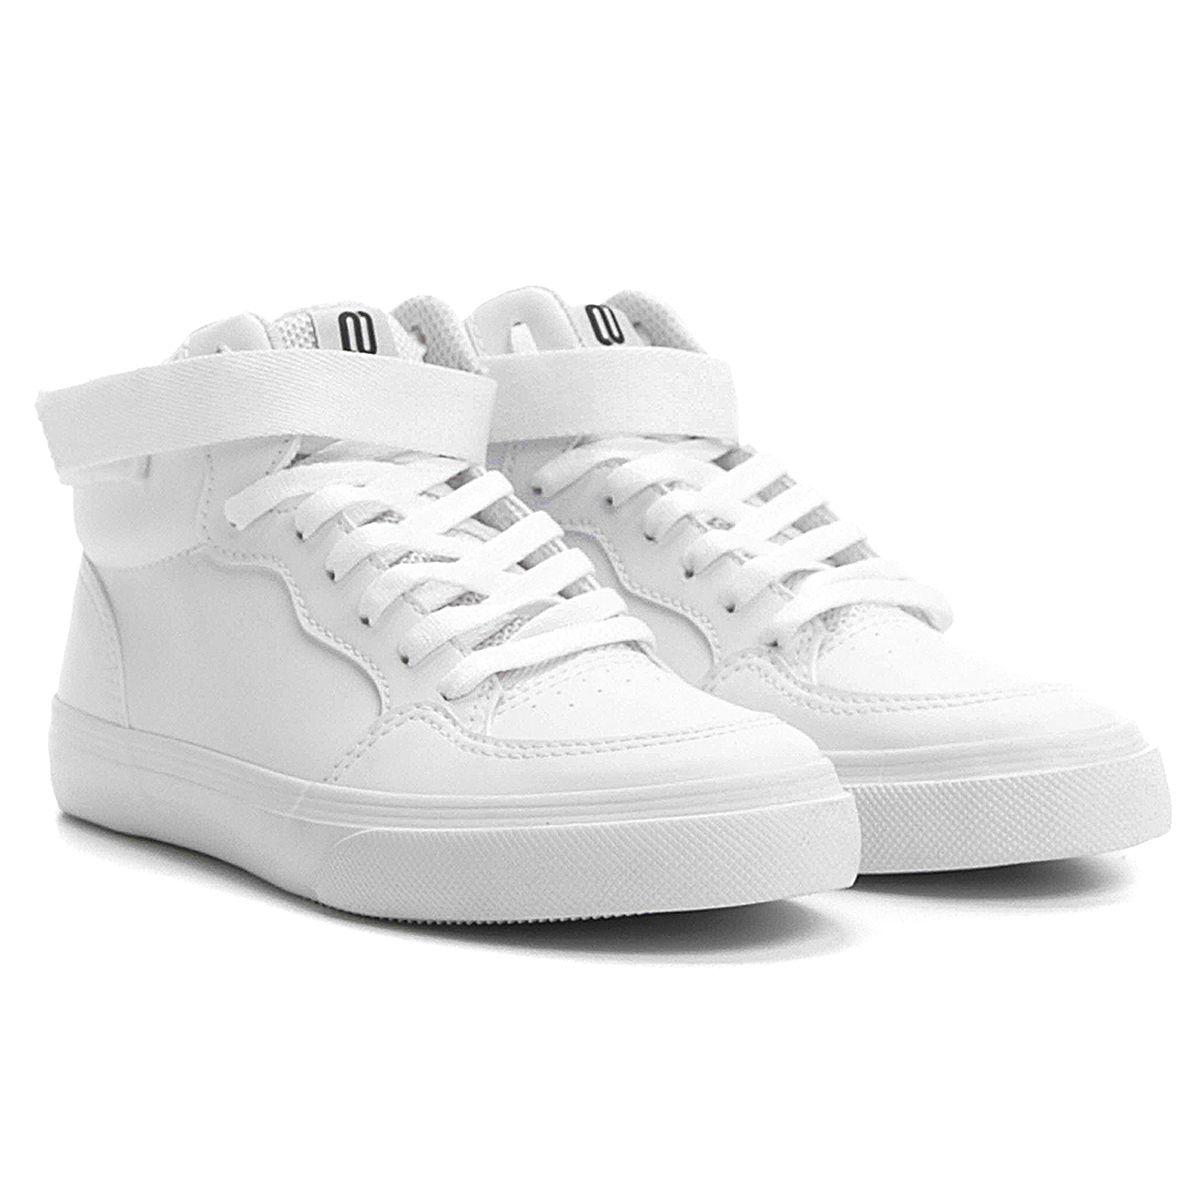 9c2a56666ad38 Tênis Whoop Cano Alto Velcro Branco   Netshoes    Shoes   Shoes